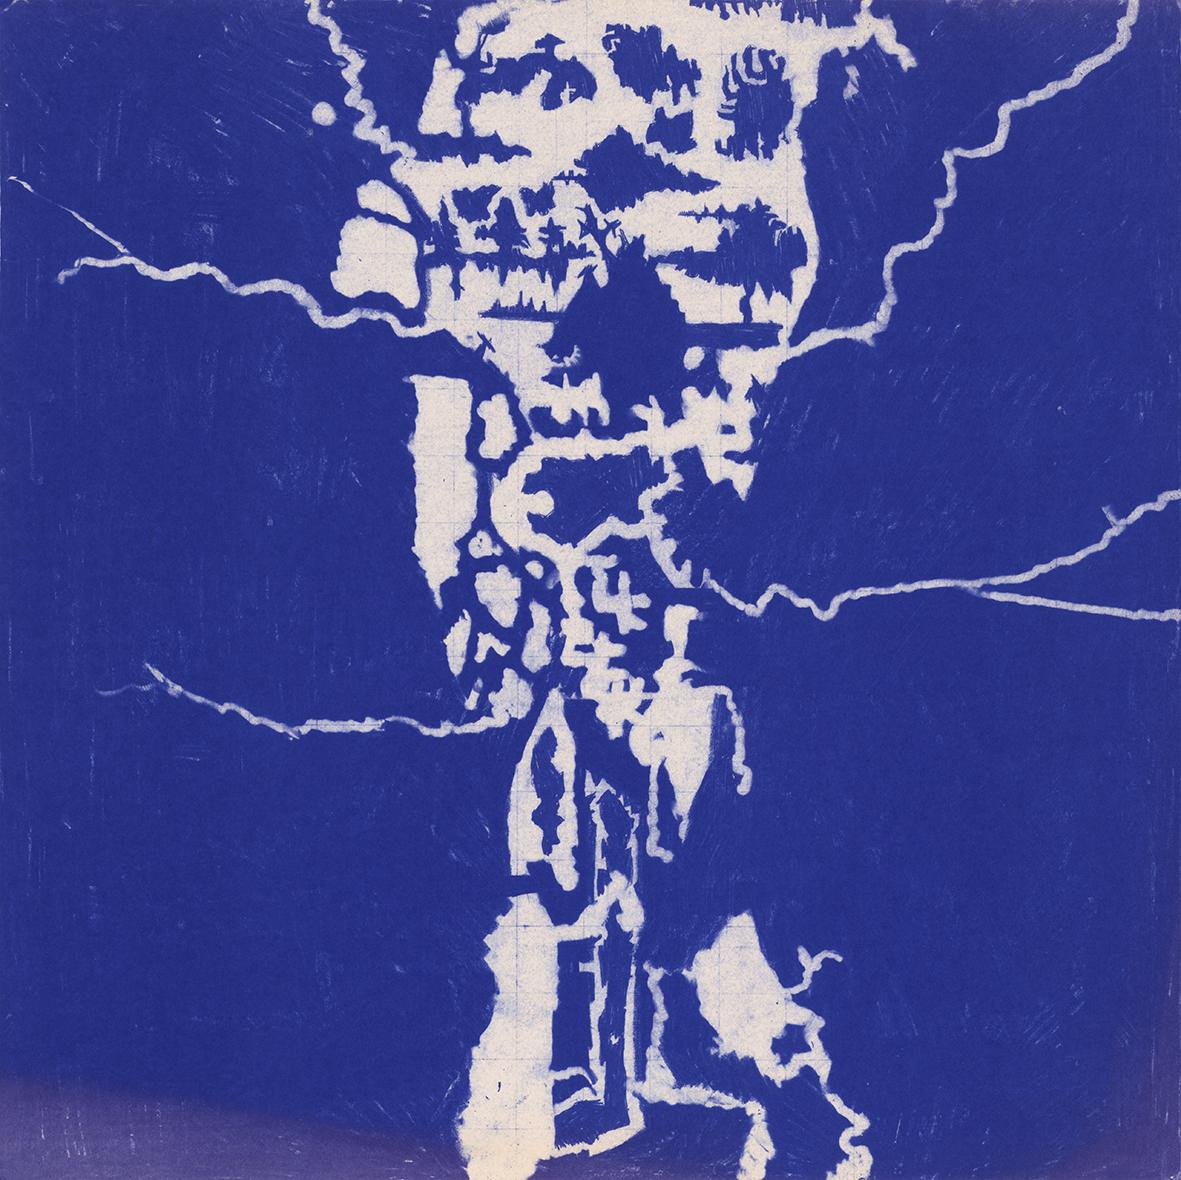 CASCADA (WATERFALL), 1991